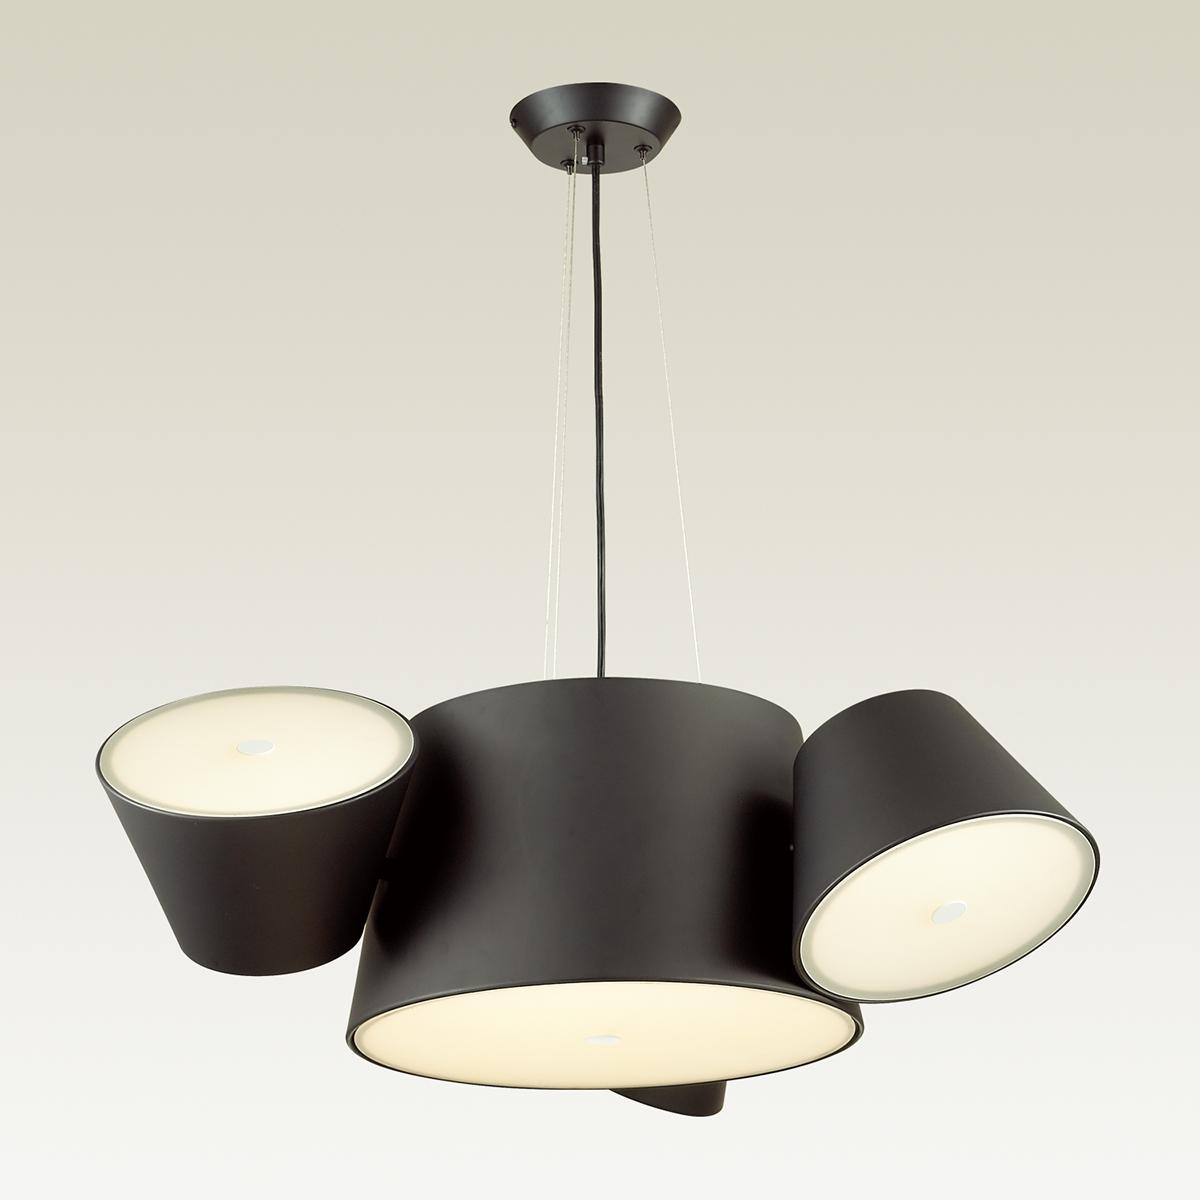 Подвесная люстра Odeon Light Charlie 3990/4, 3xE14x40W +  6xG9x40W, черный, металл, стекло - фото 1